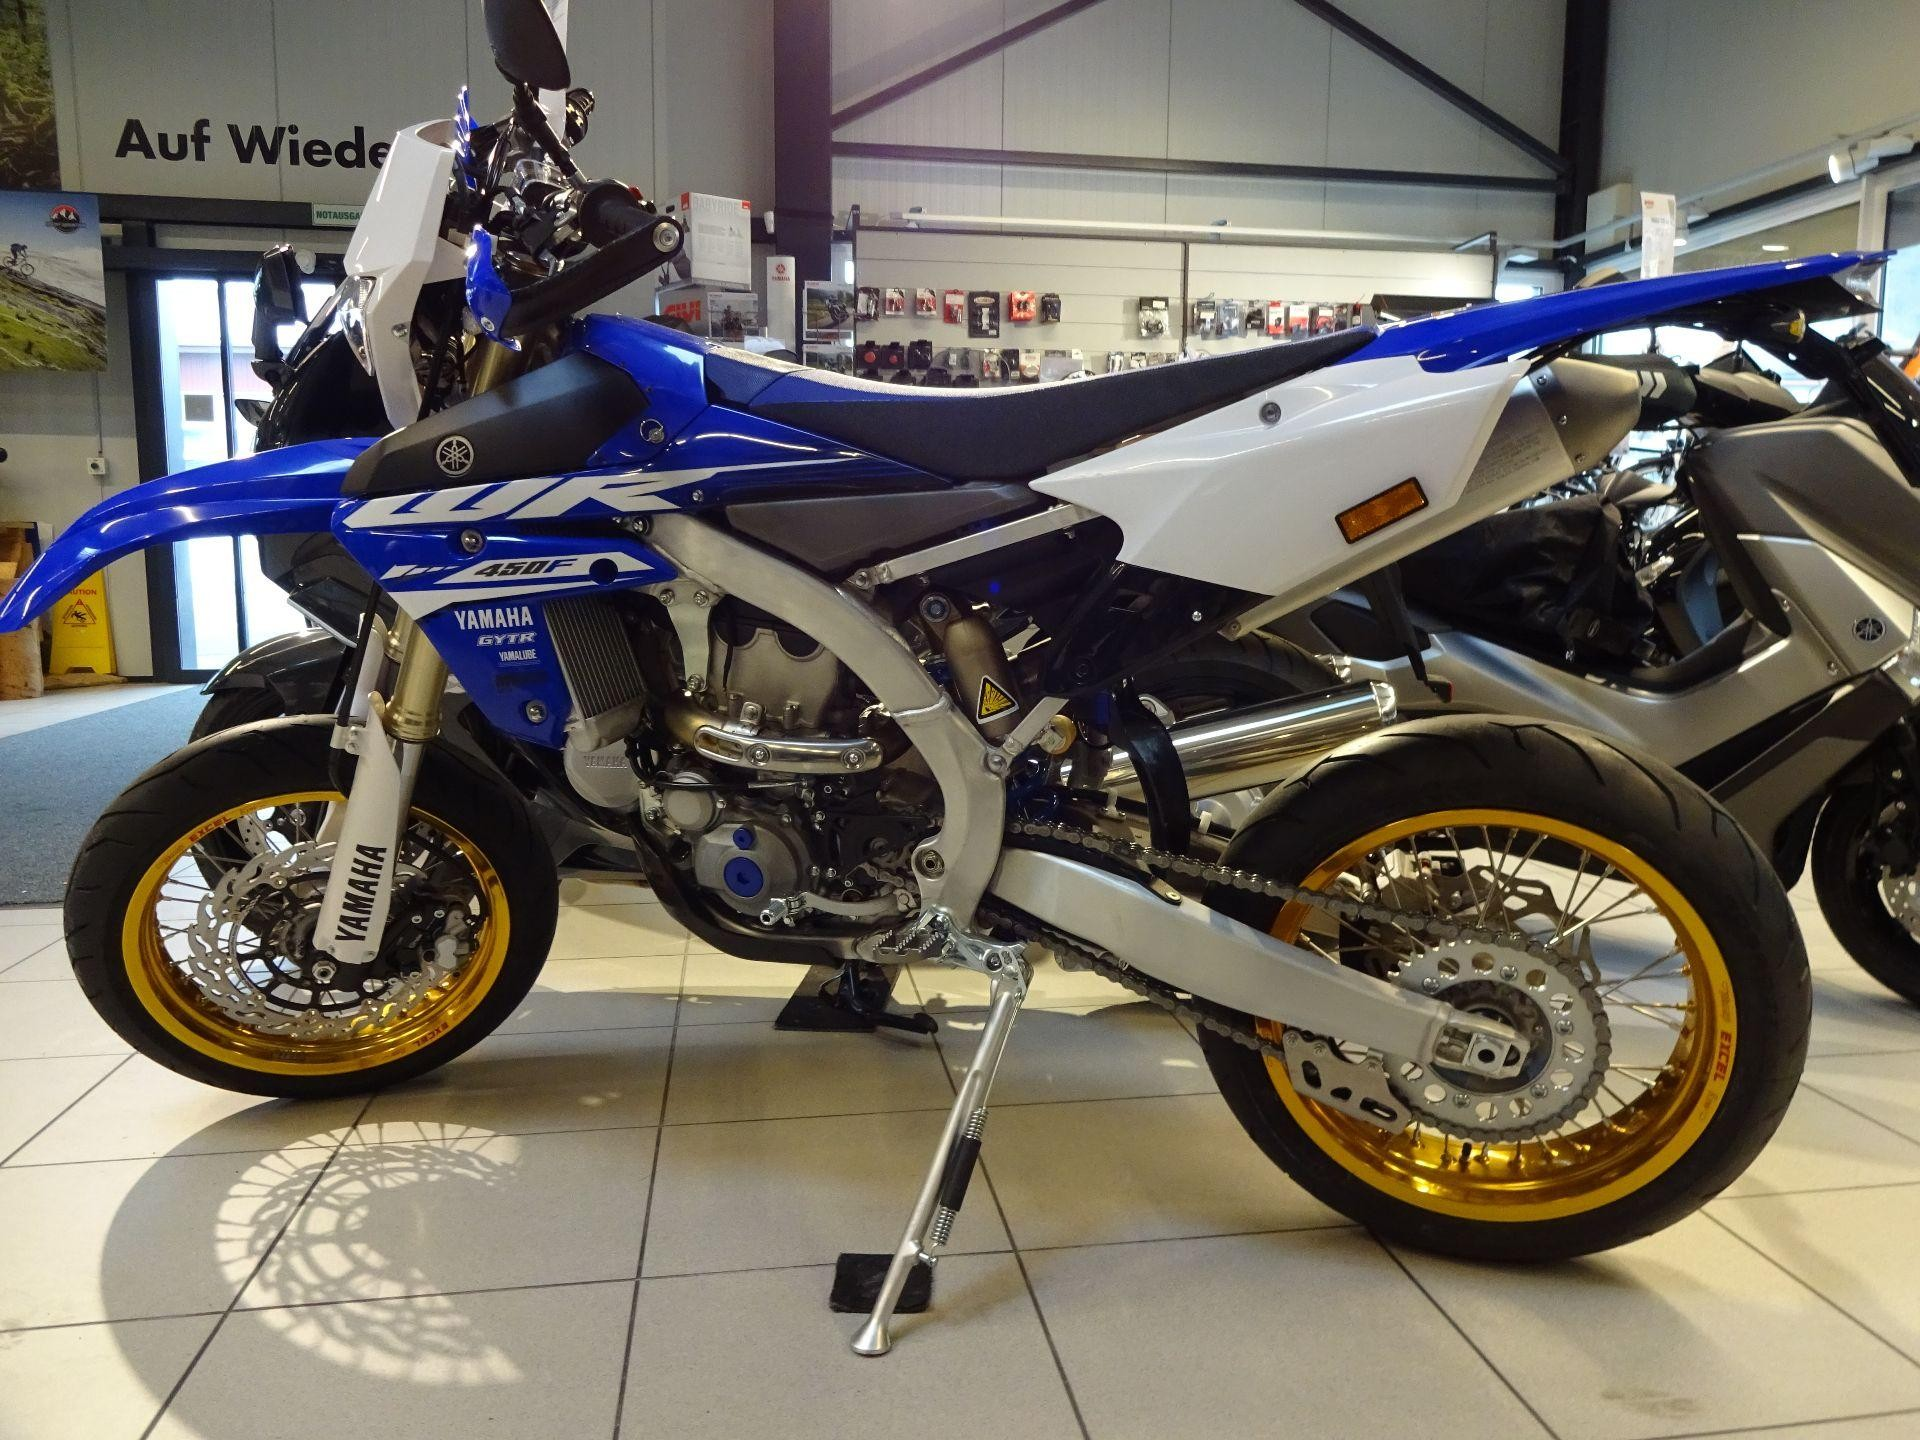 Buy motorbike New vehicle/bike YAMAHA WR 450 F Supermoto Lucky Star ...